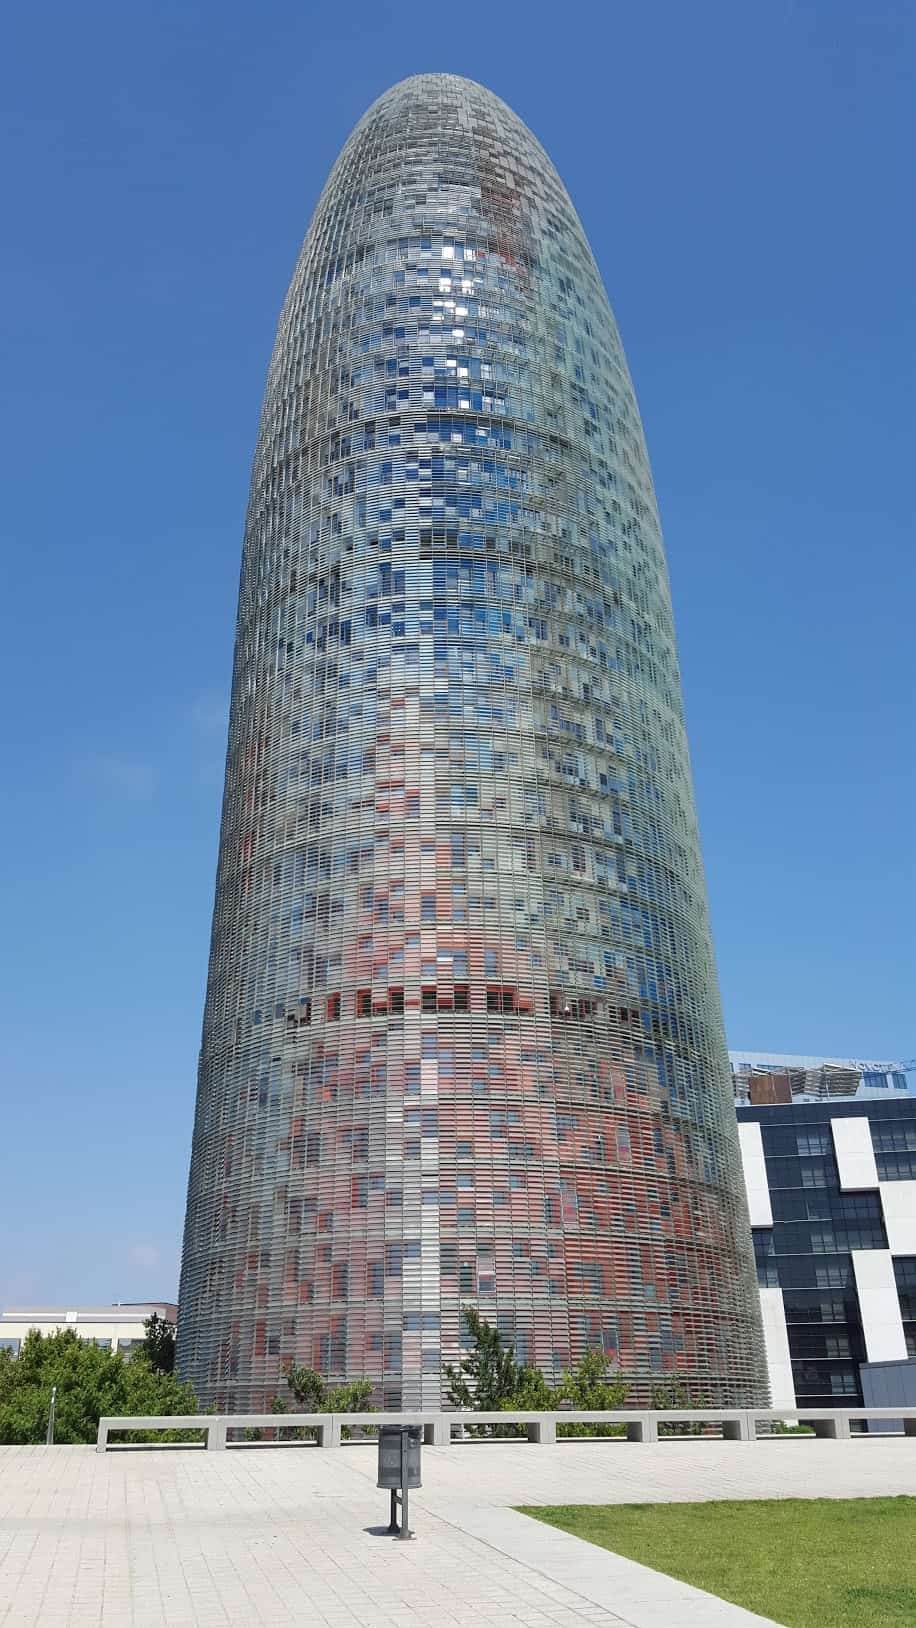 Башня Агбар - Agbar Tower - достопримечательности Барселоны